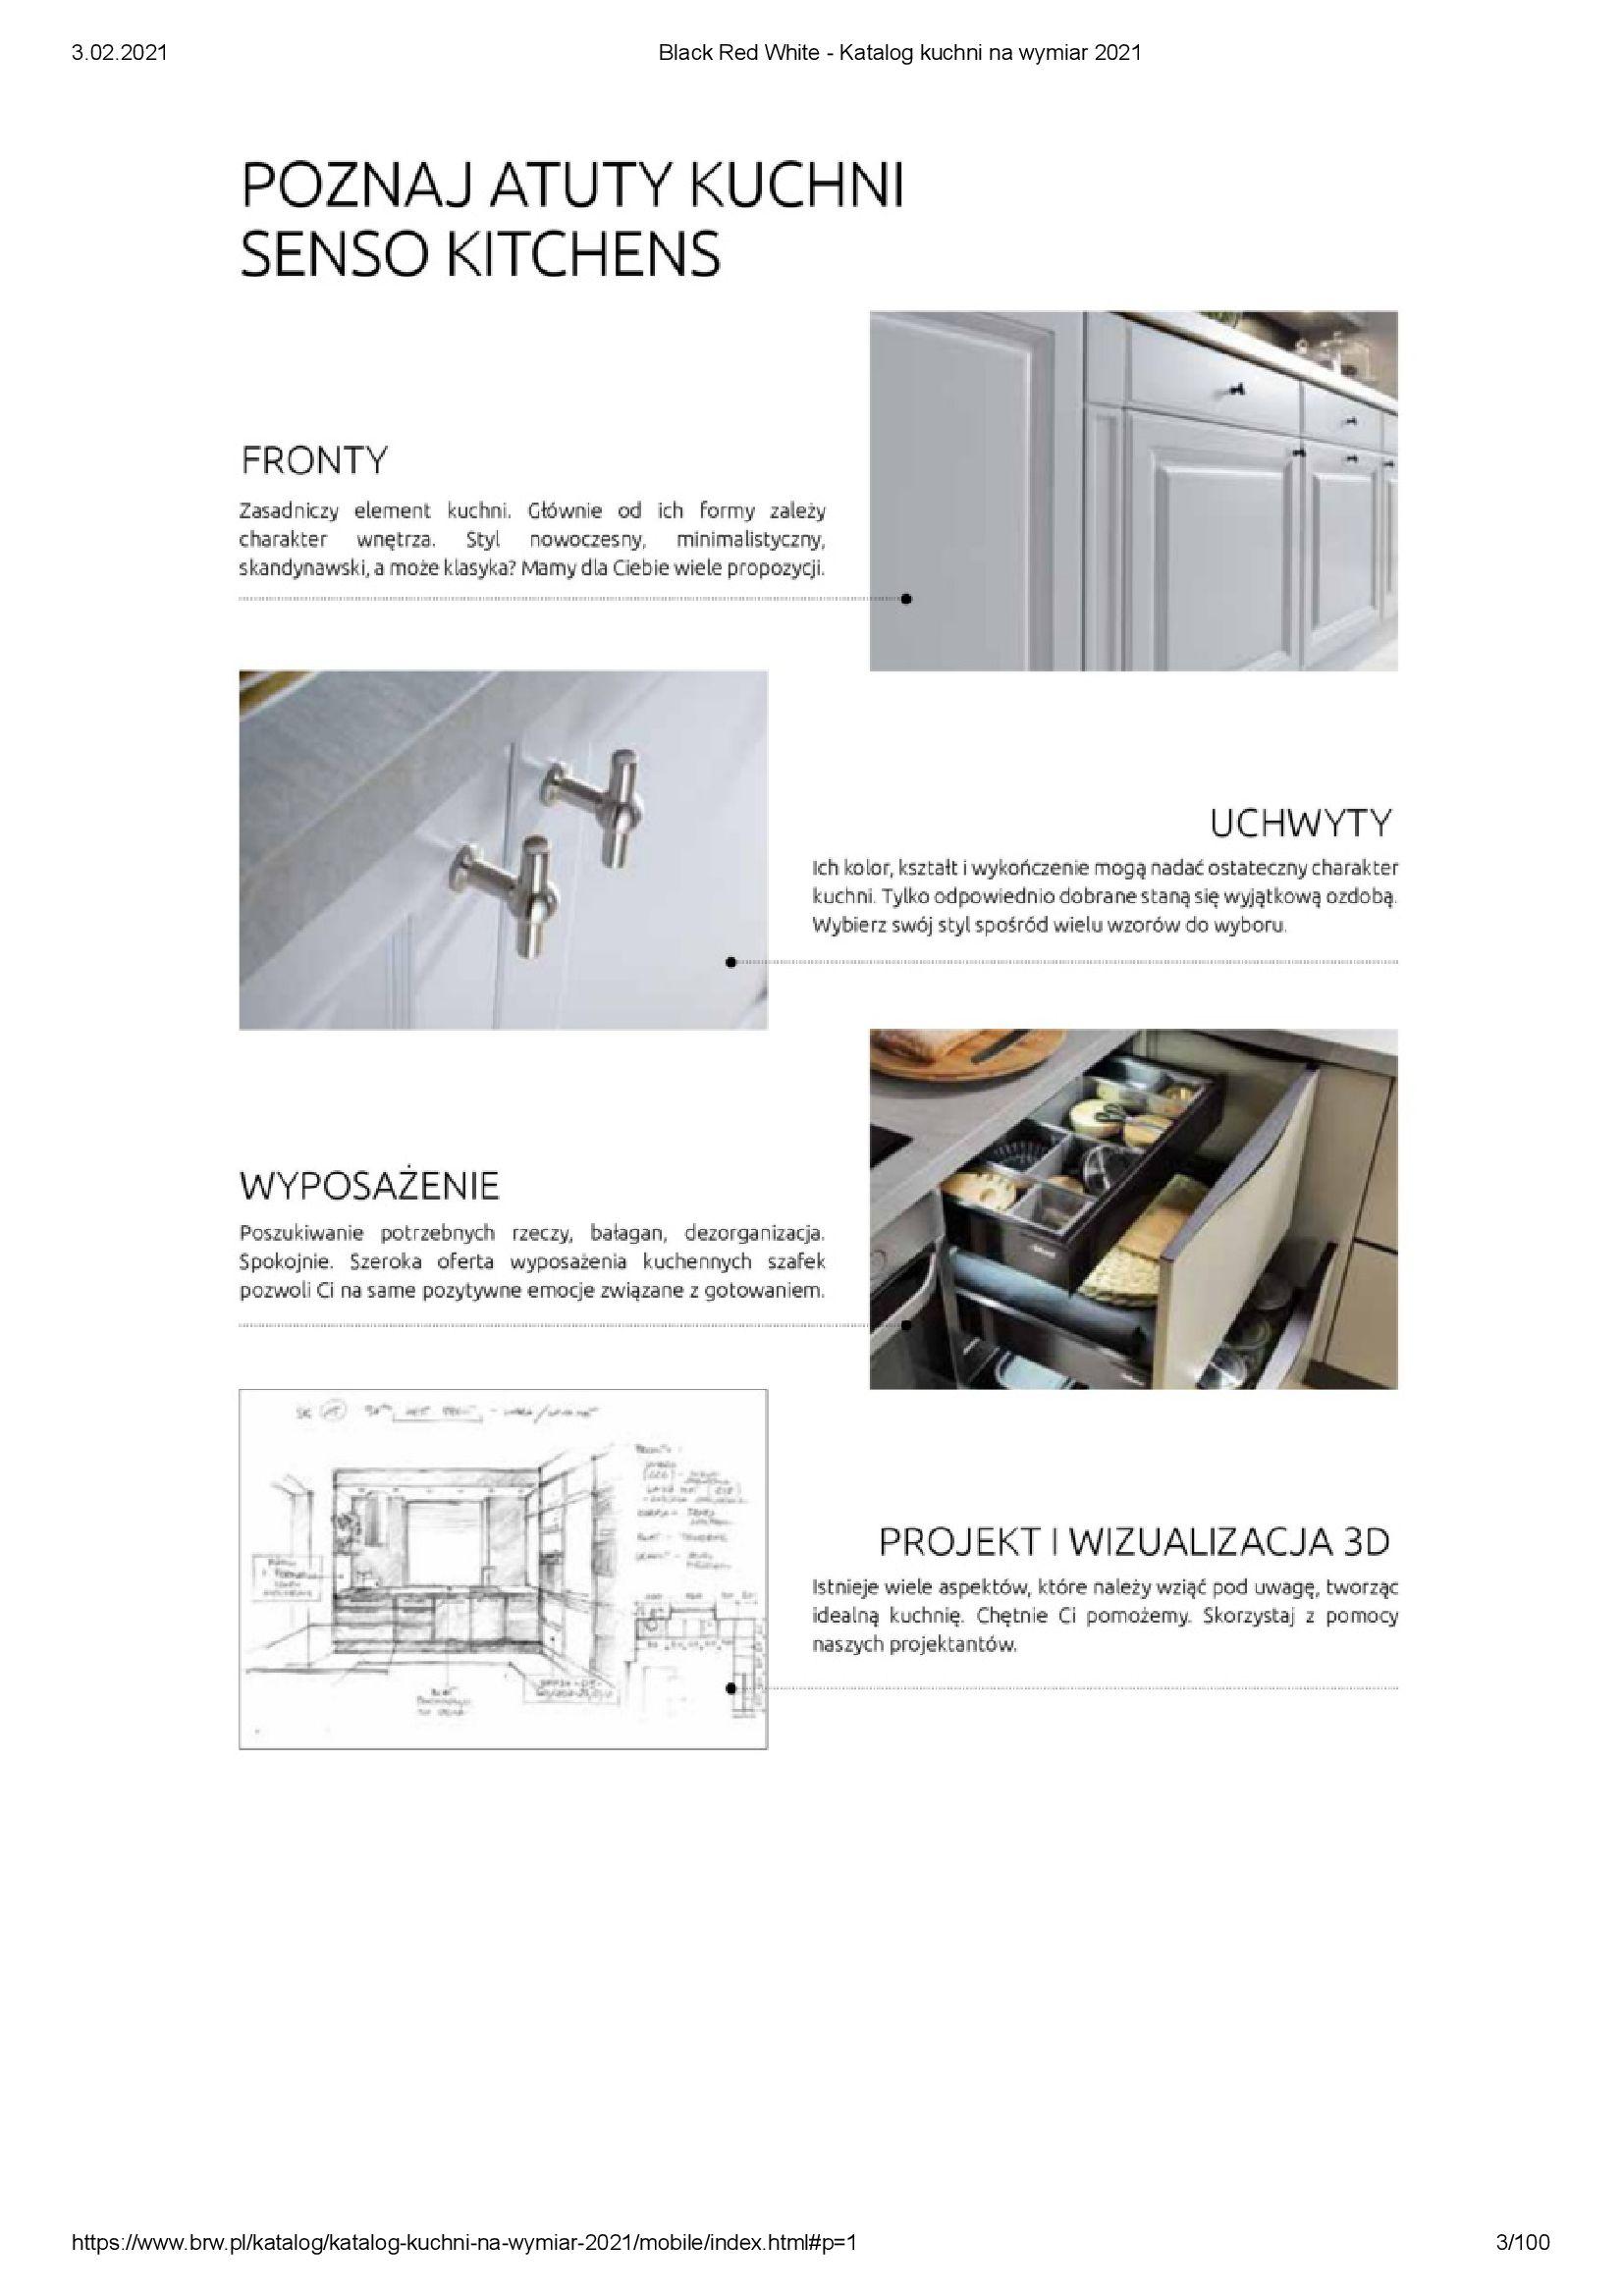 Gazetka Black Red White: Katalog - Kuchnie na wymiar Senso Kitchens 2021 2021-01-01 page-3